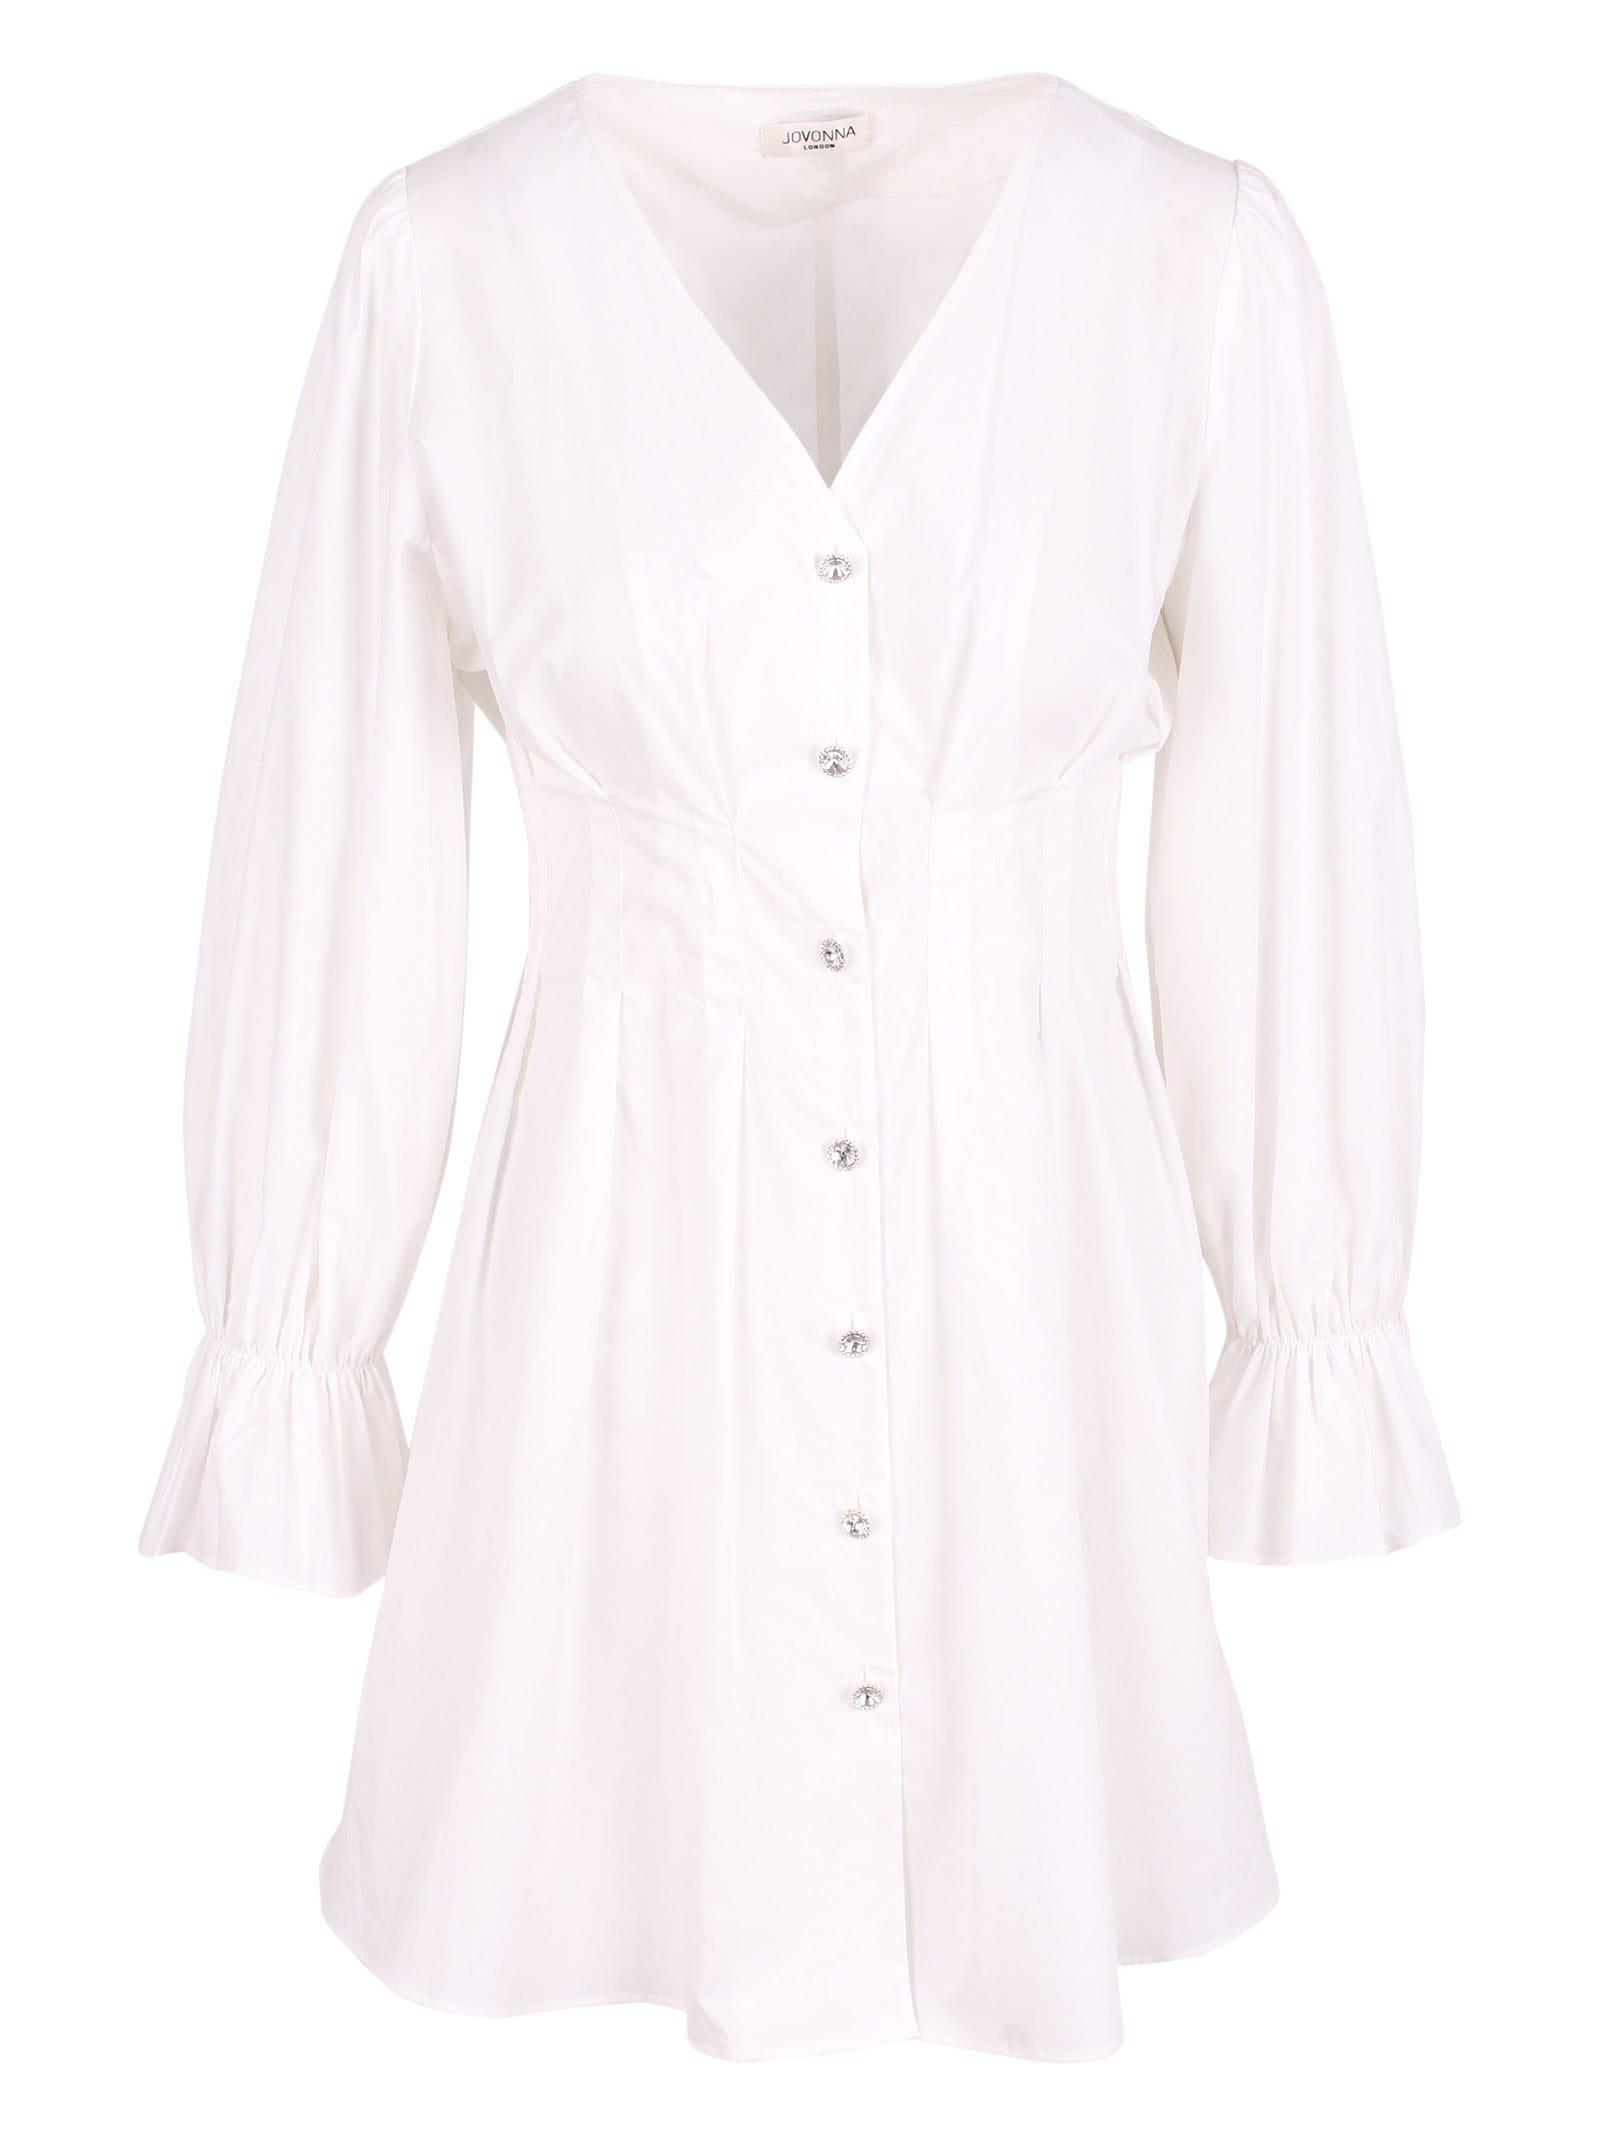 London vela Cotton Dress